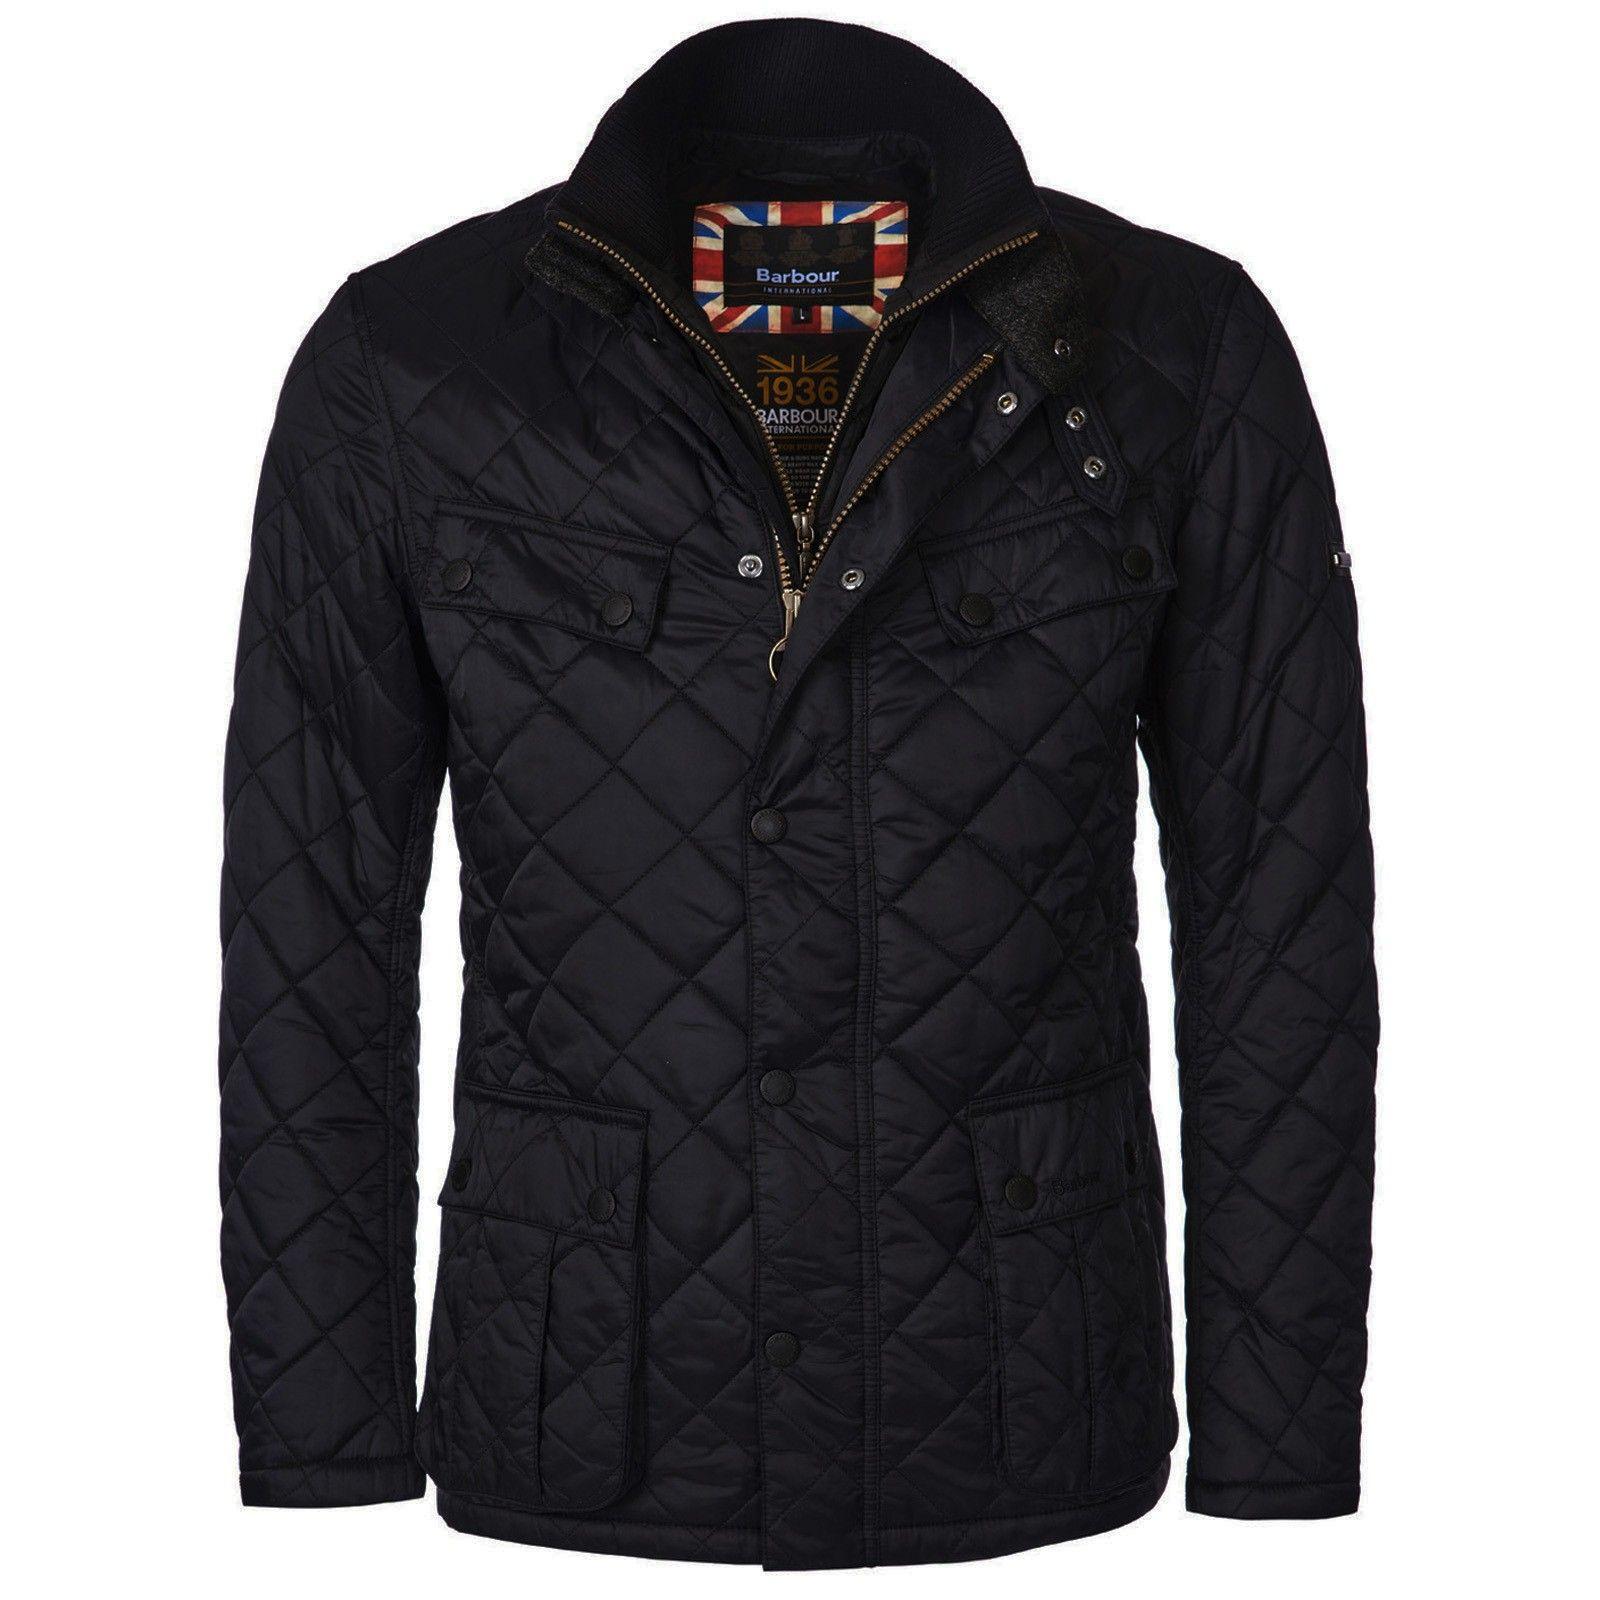 Barbour Windshield Jacket Black Barbour clothing